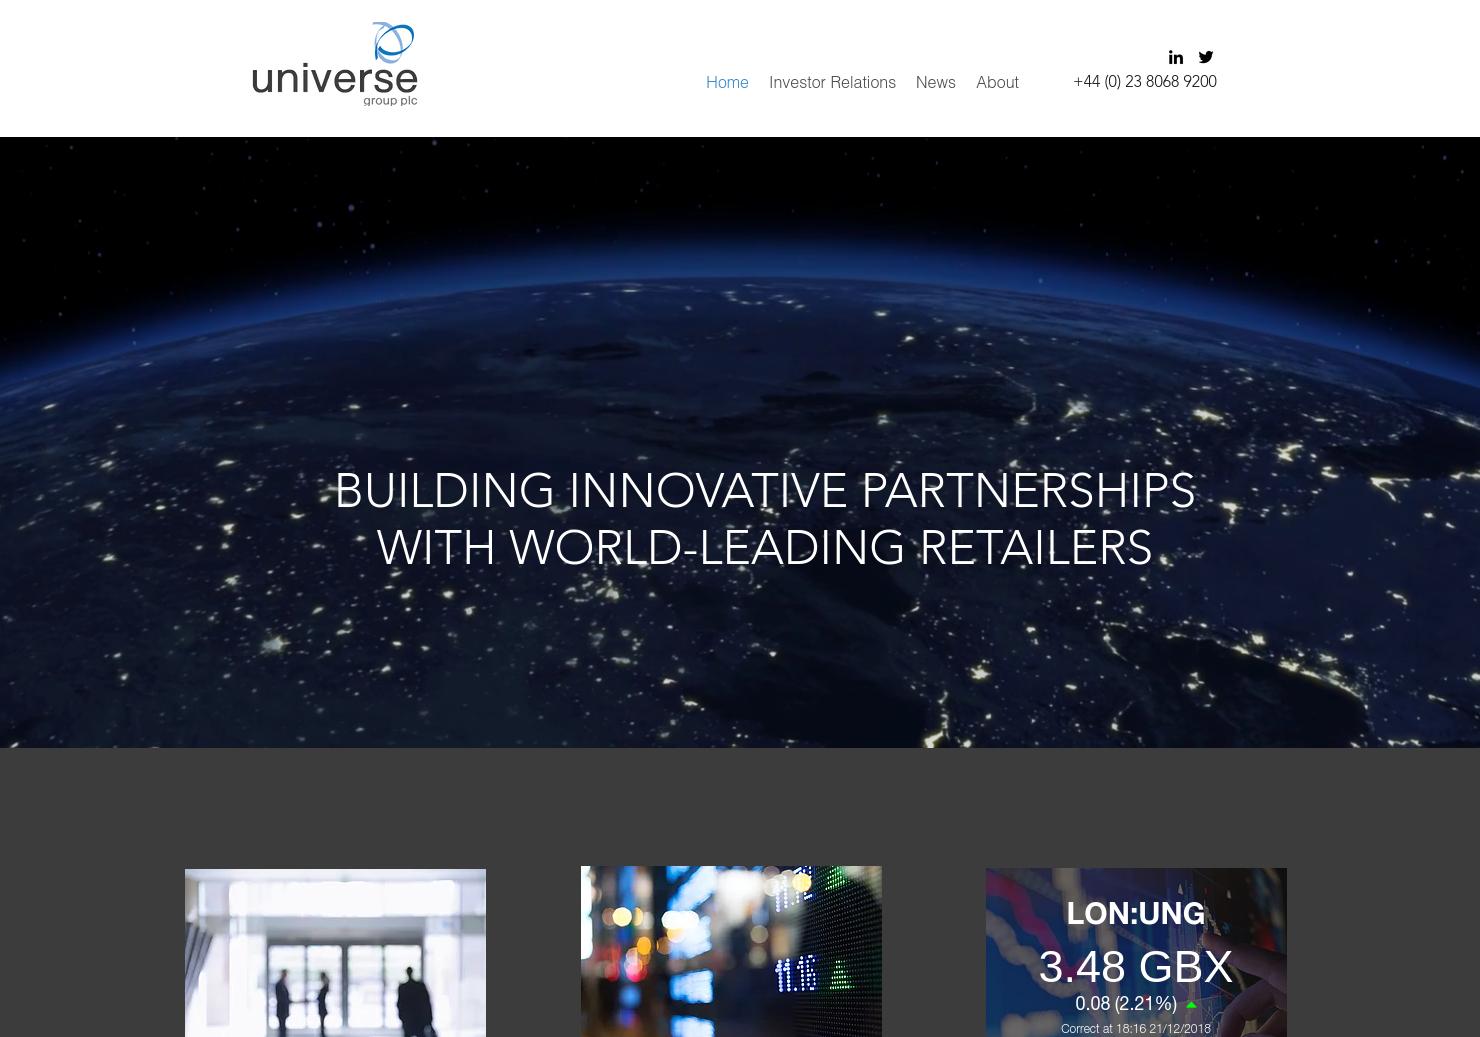 Universe Home Page